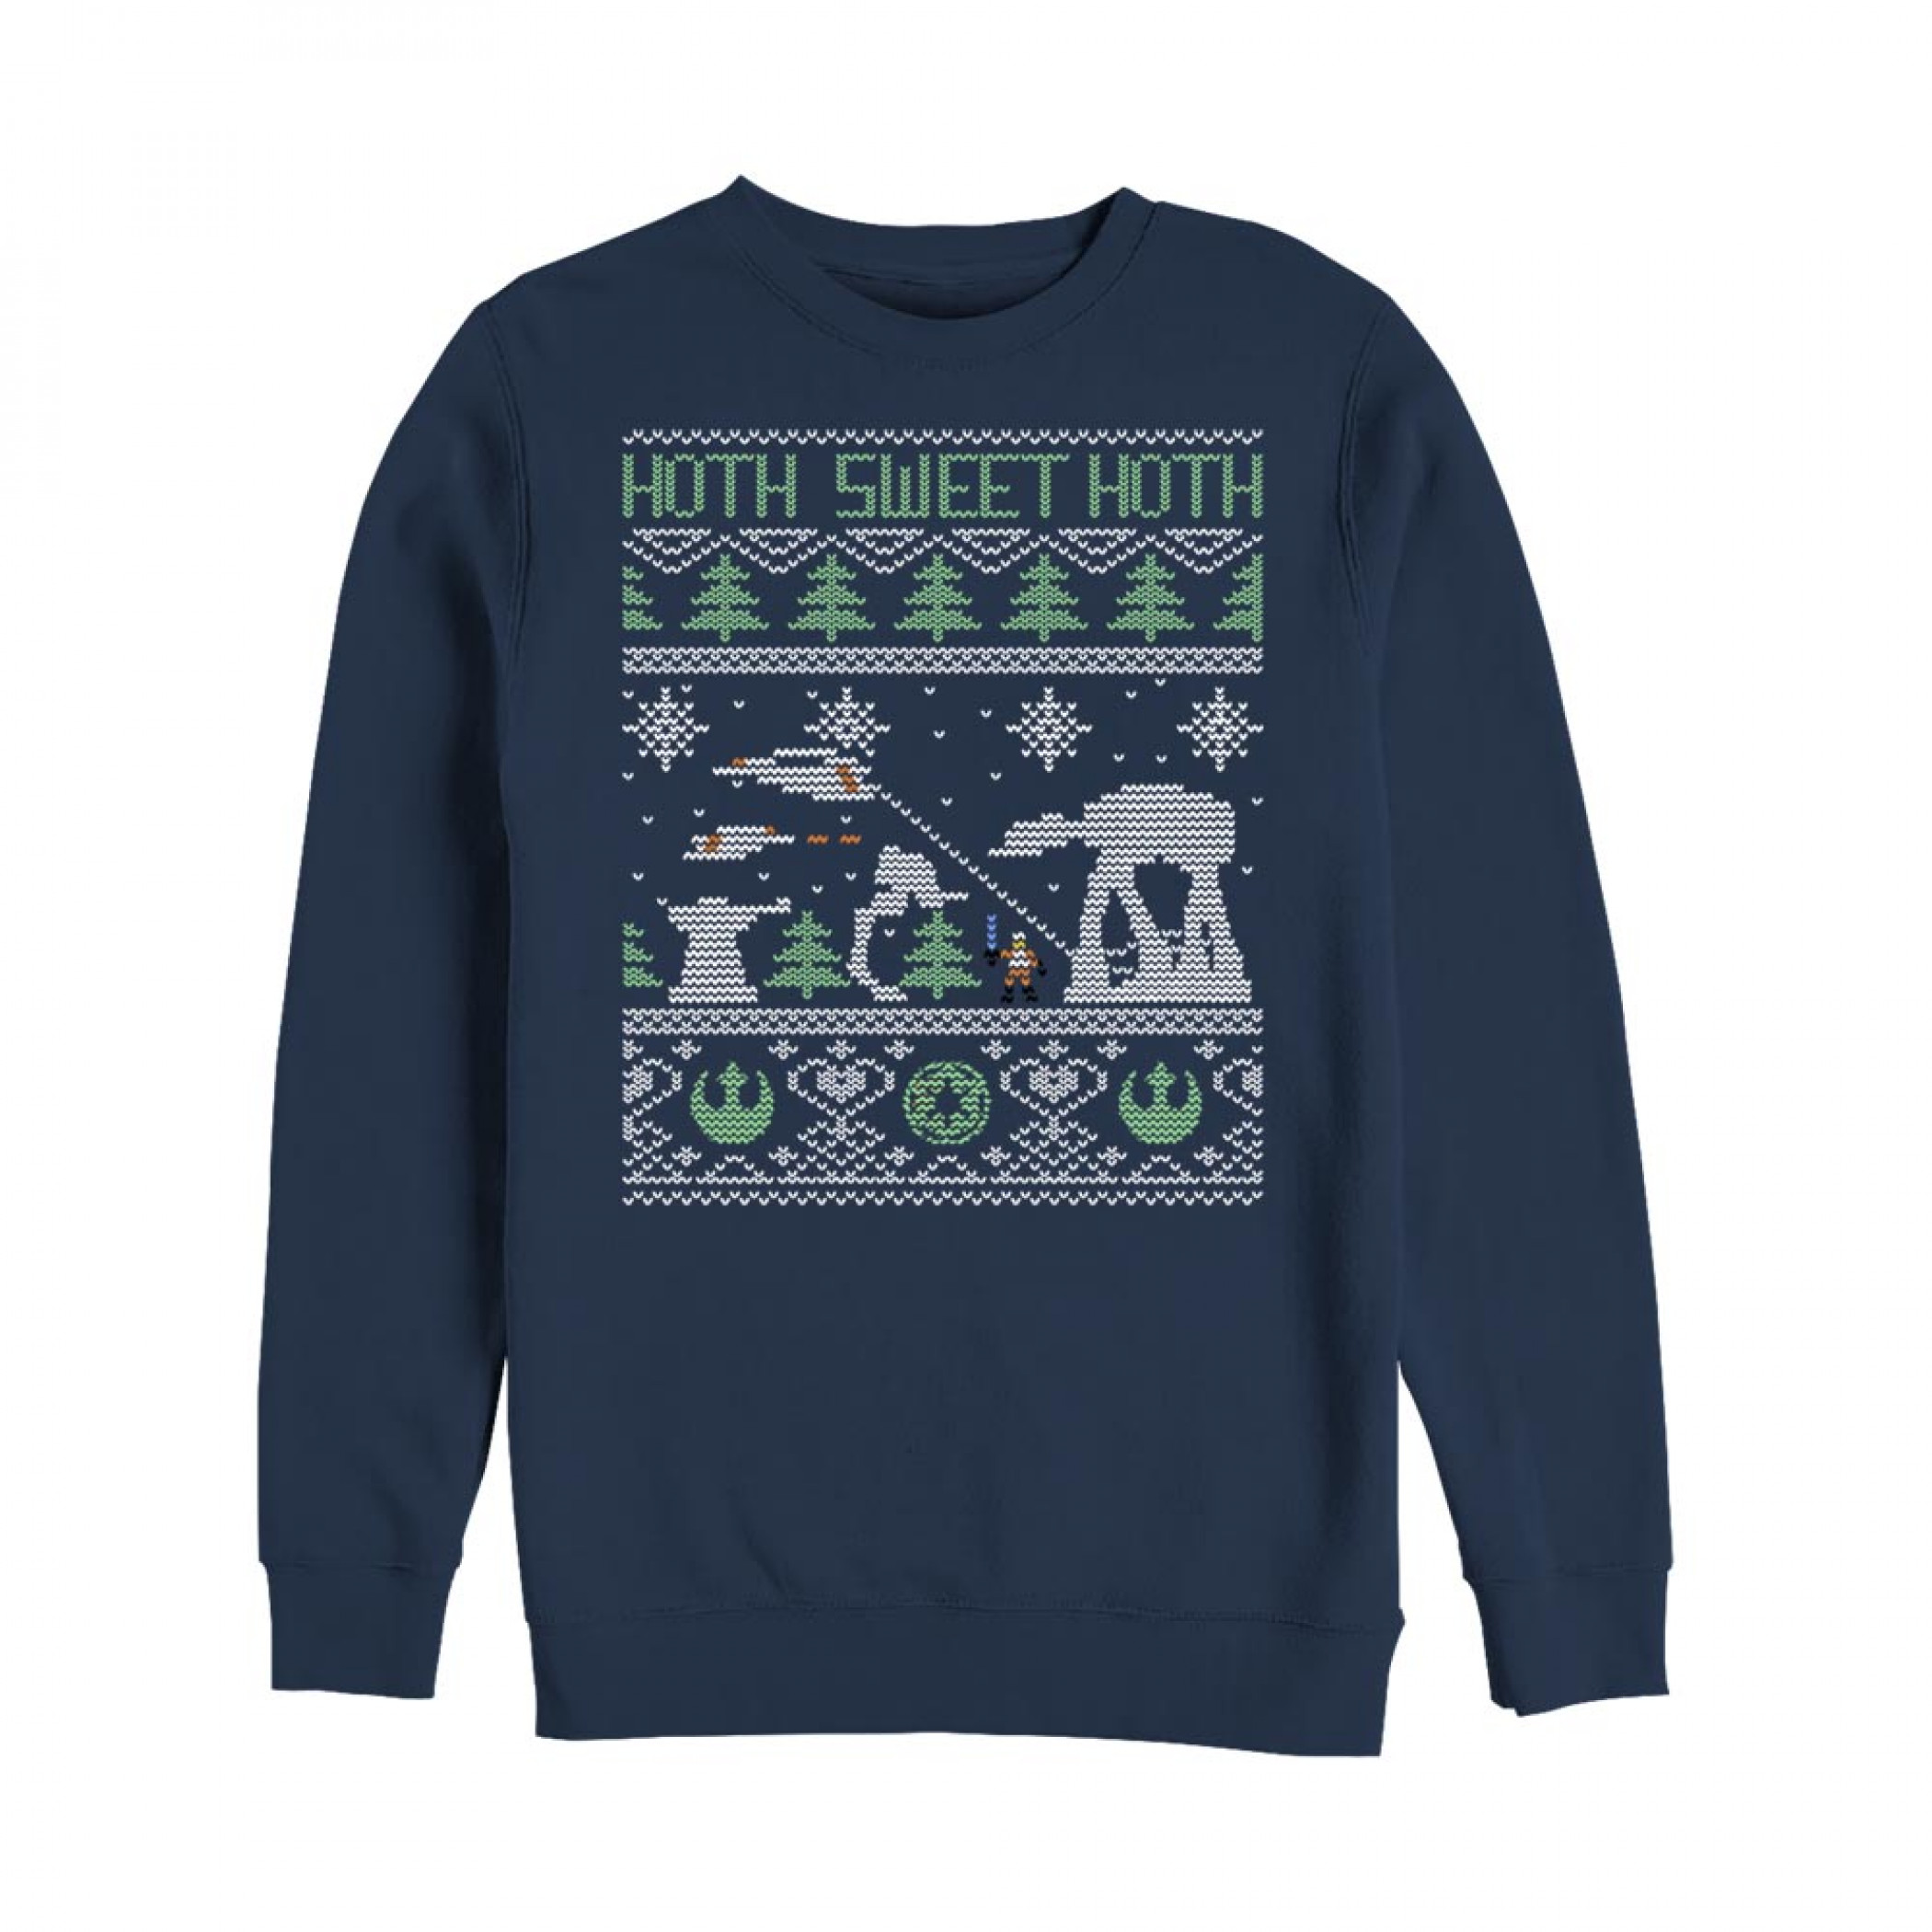 Star Wars Hoth Sweet Hoth Ugly Christmas Sweatshirt